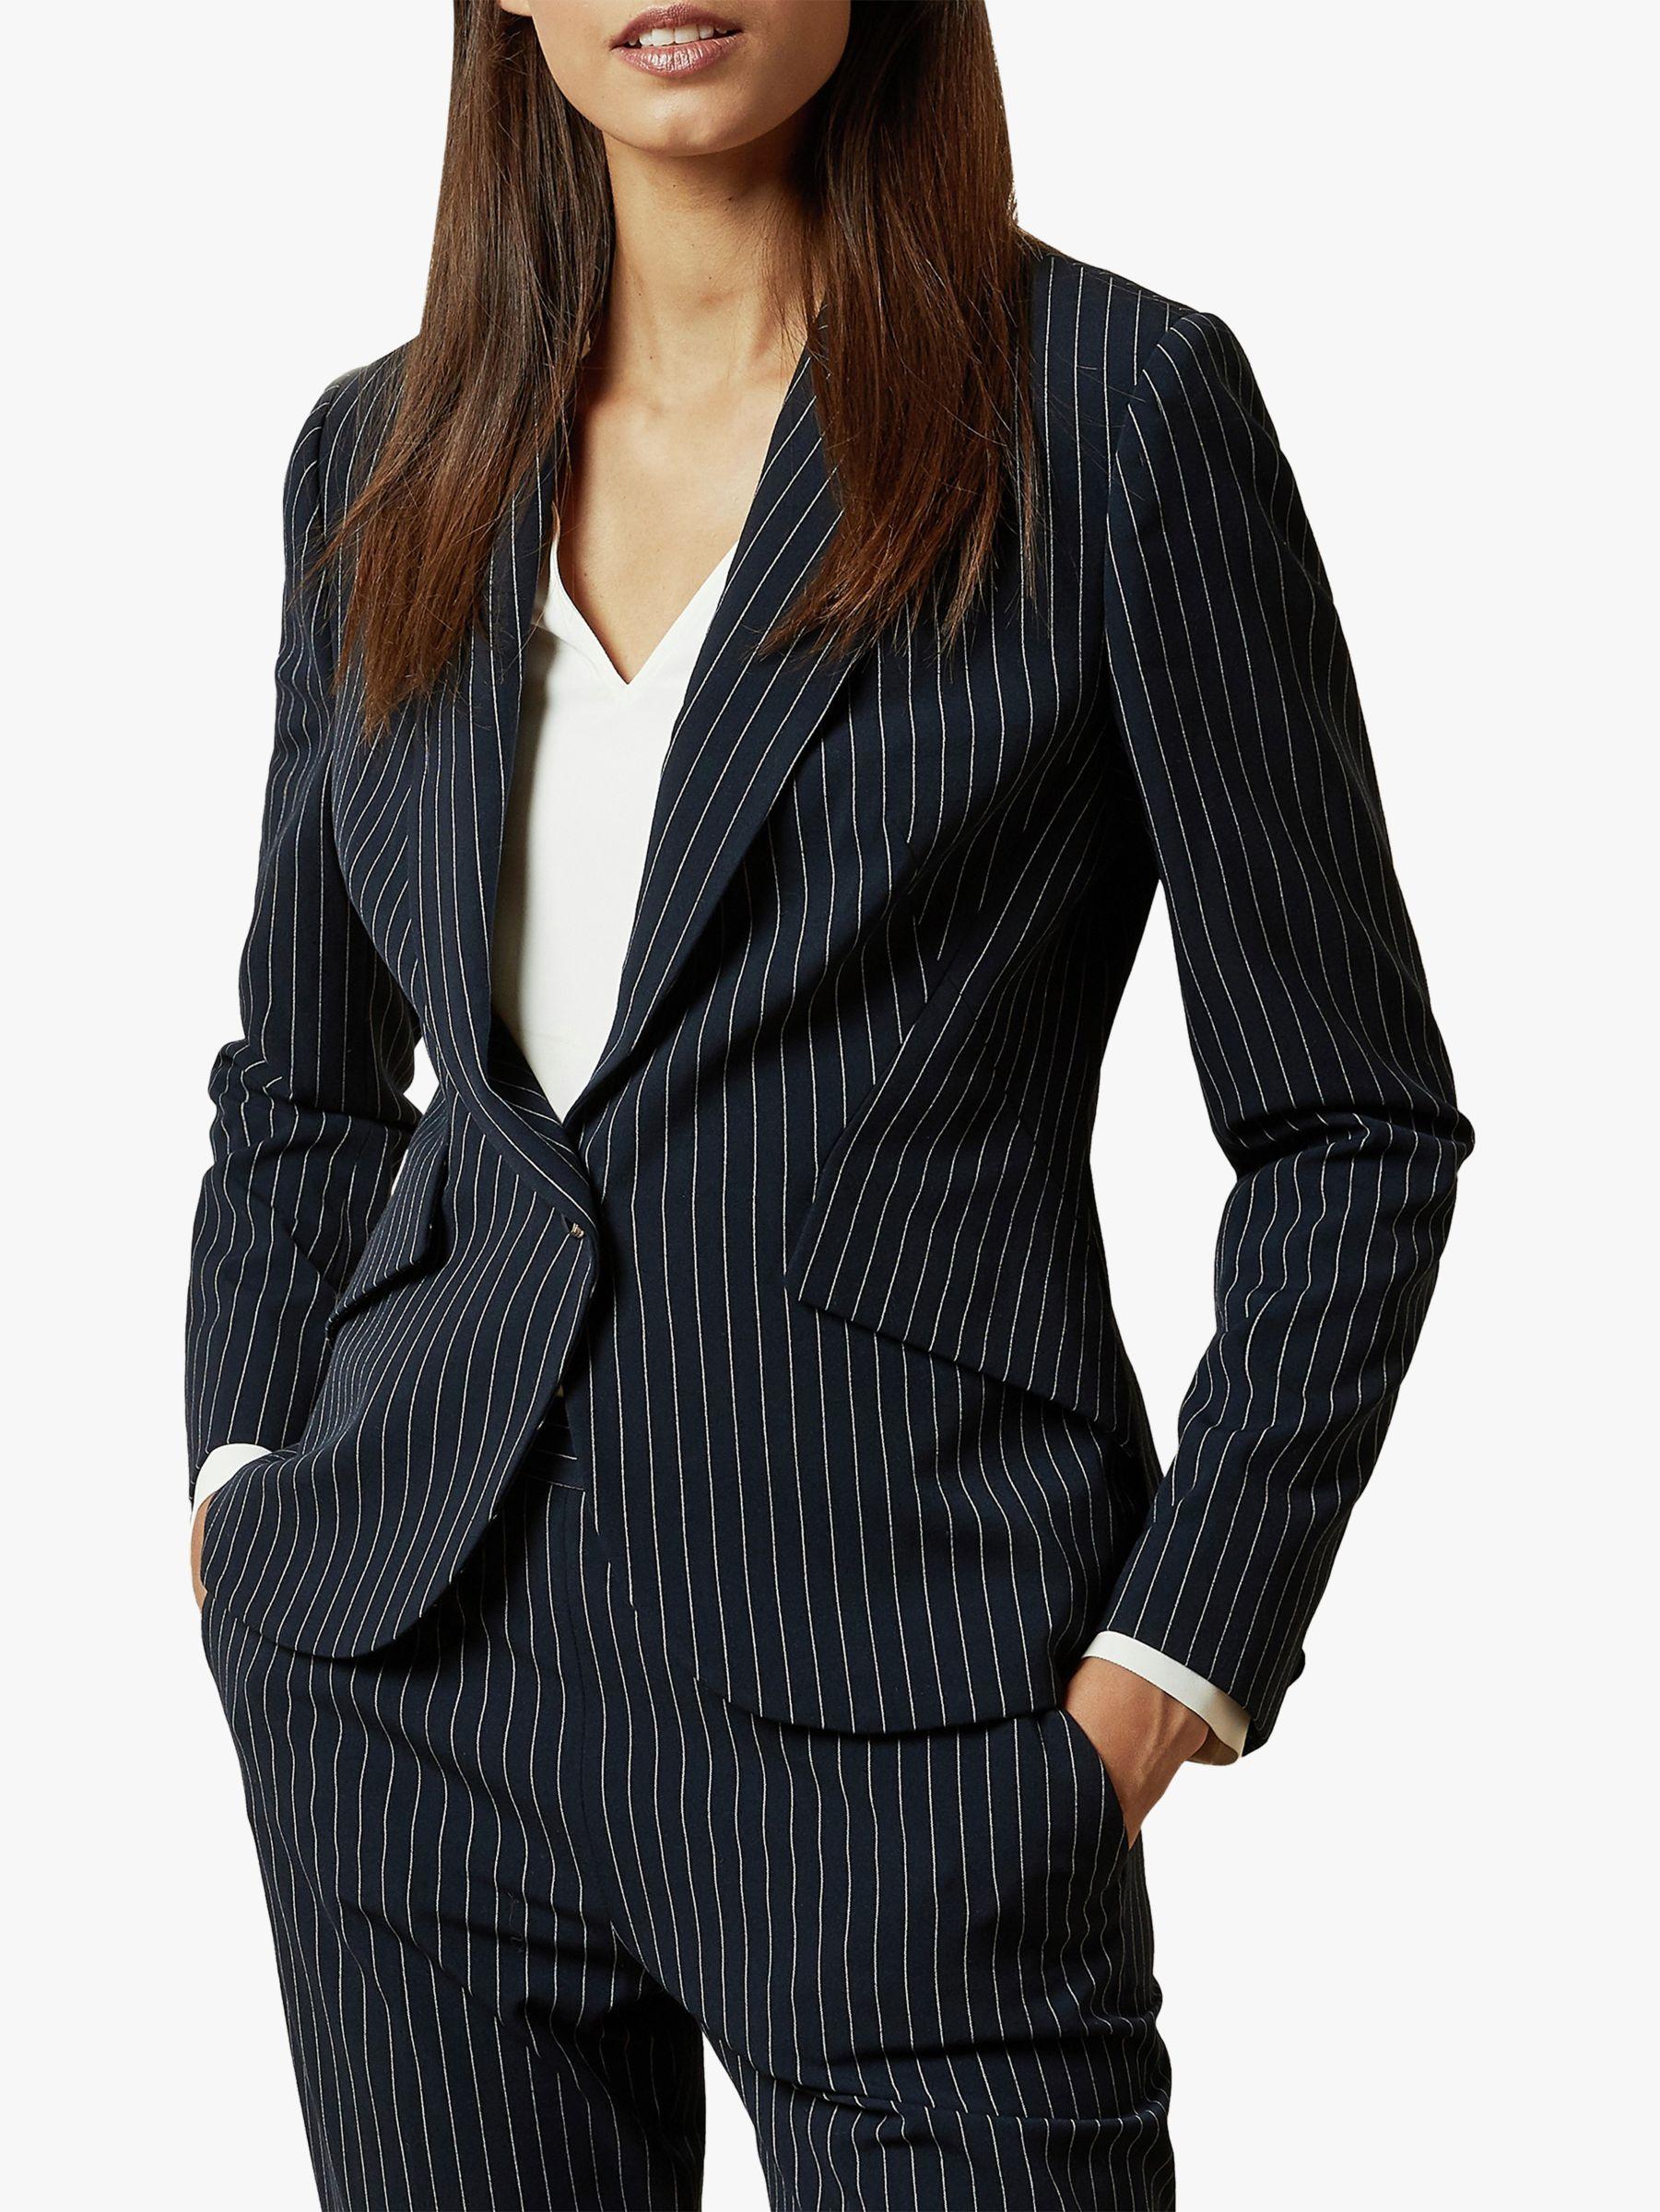 Ted Baker Ted Baker Angila Suit Pinstripe Jacket, Dark Blue